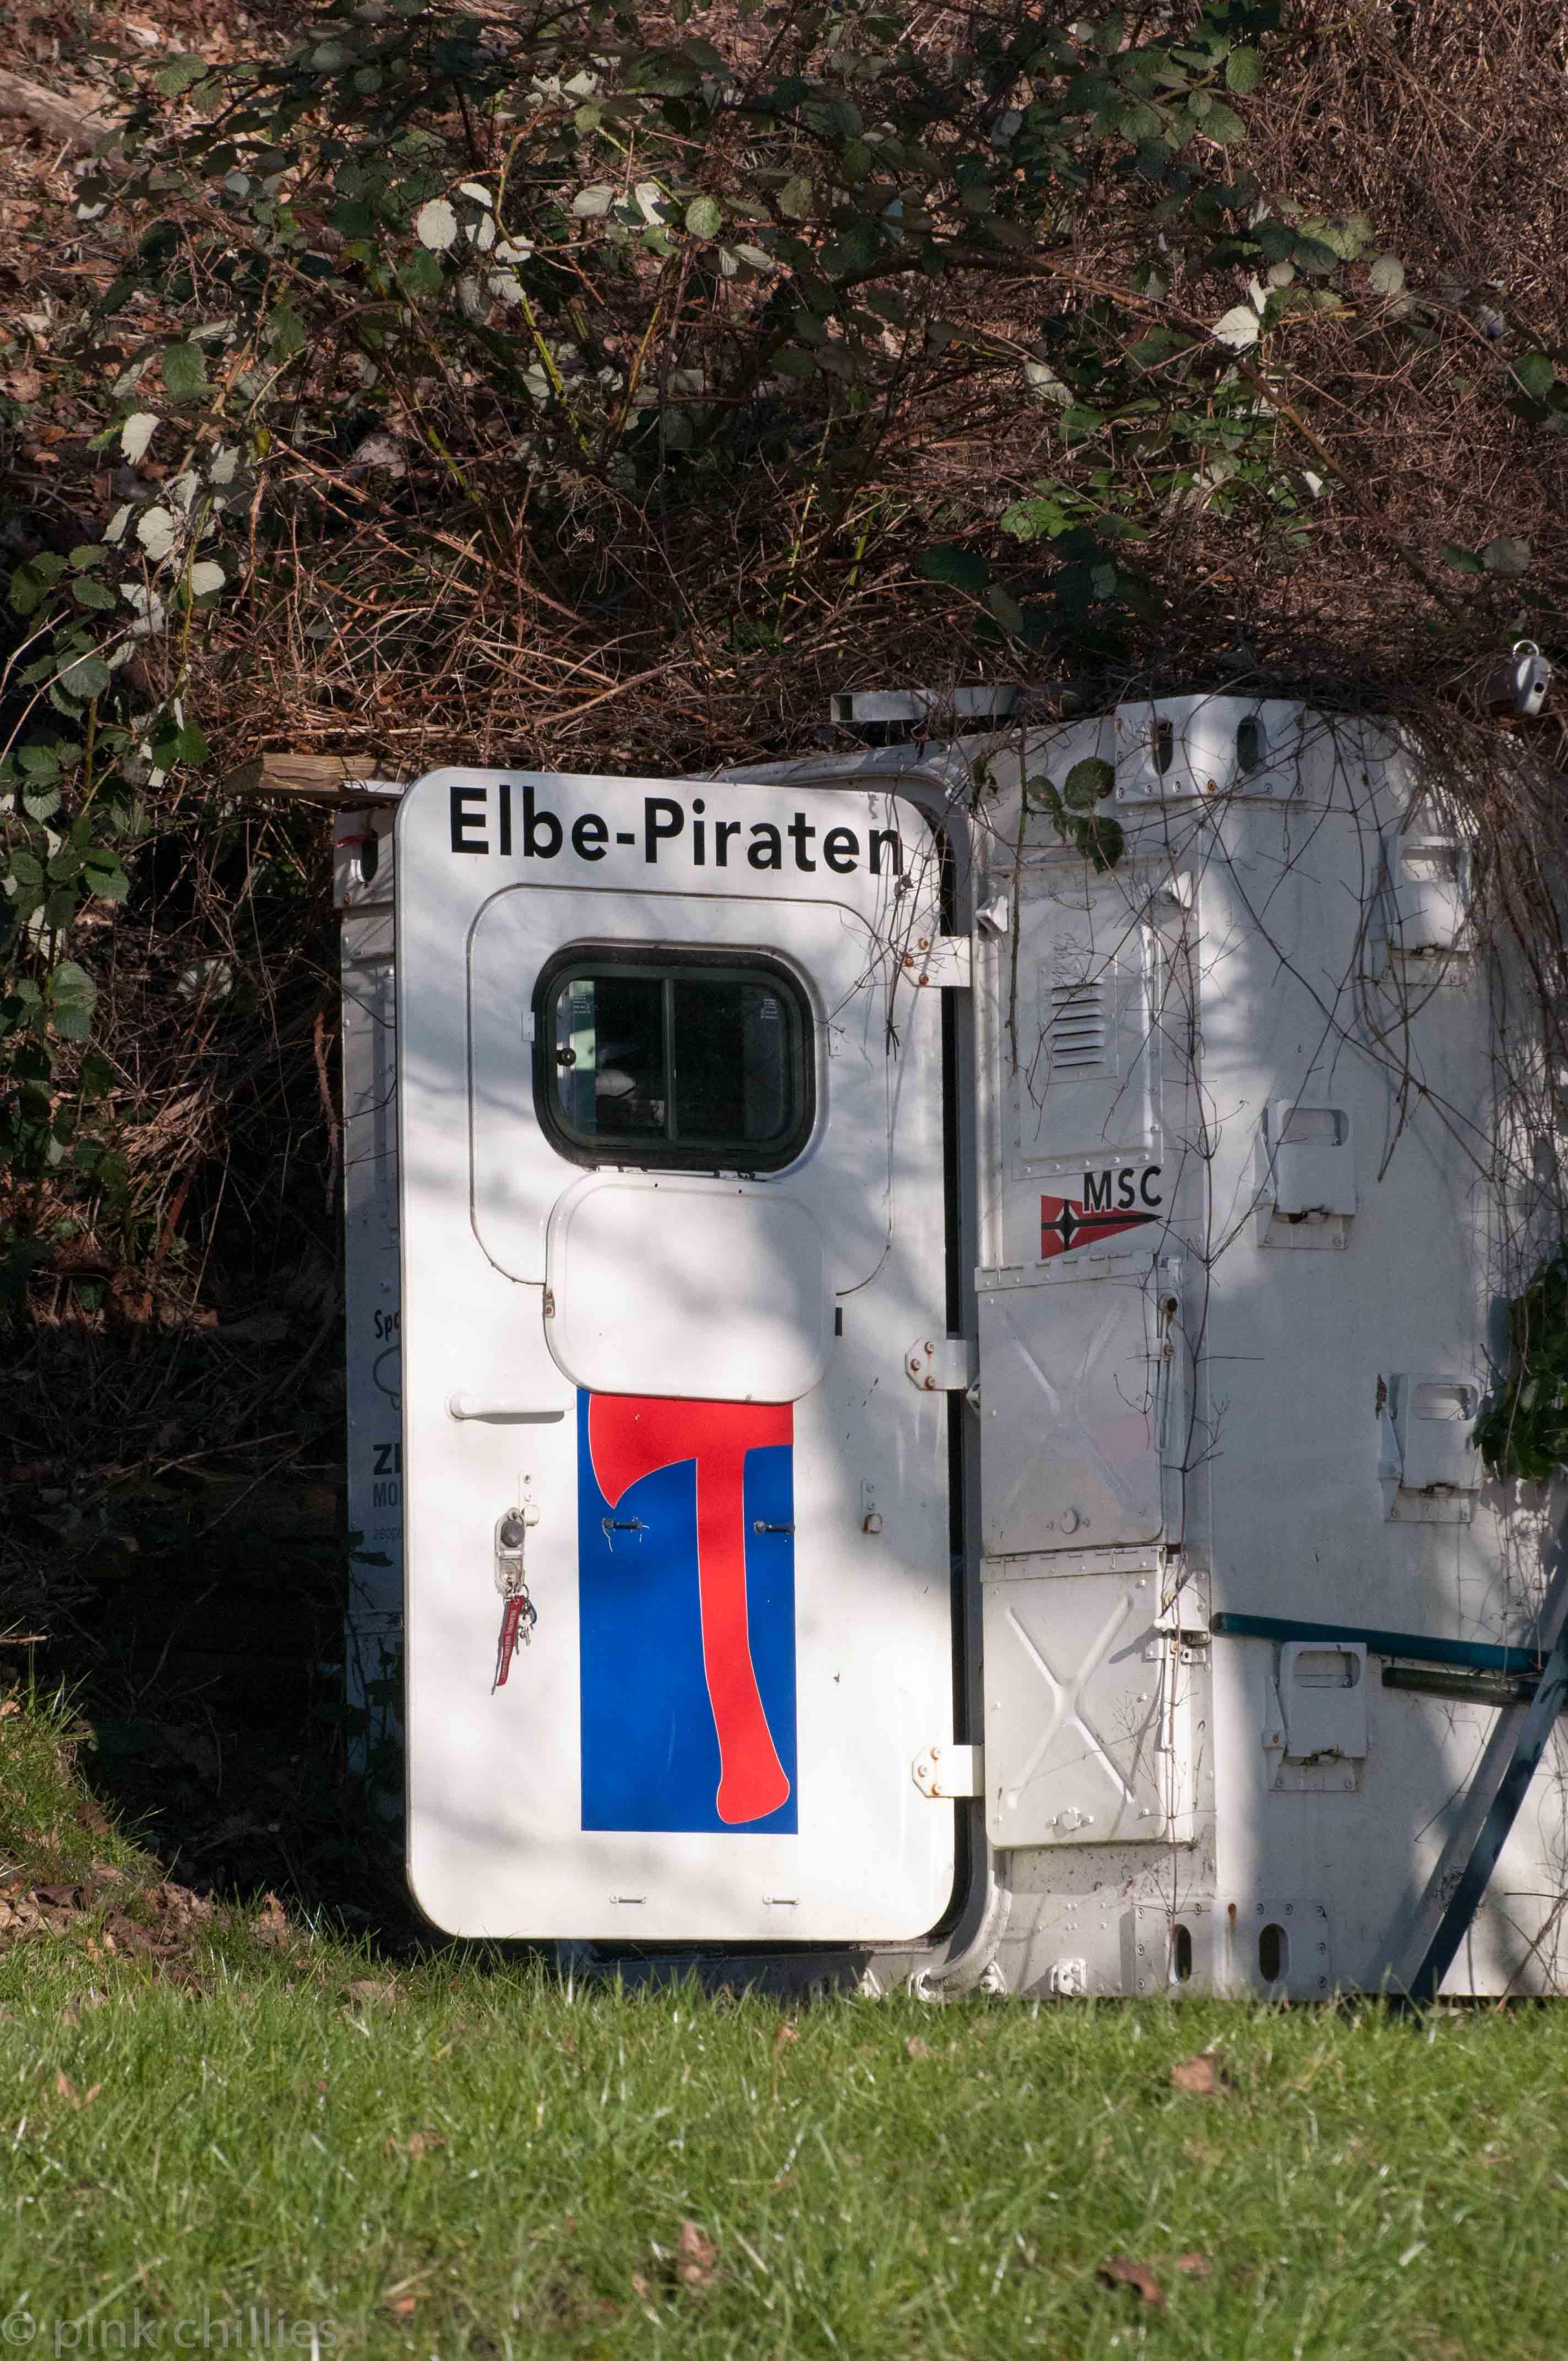 Elbe Piraten